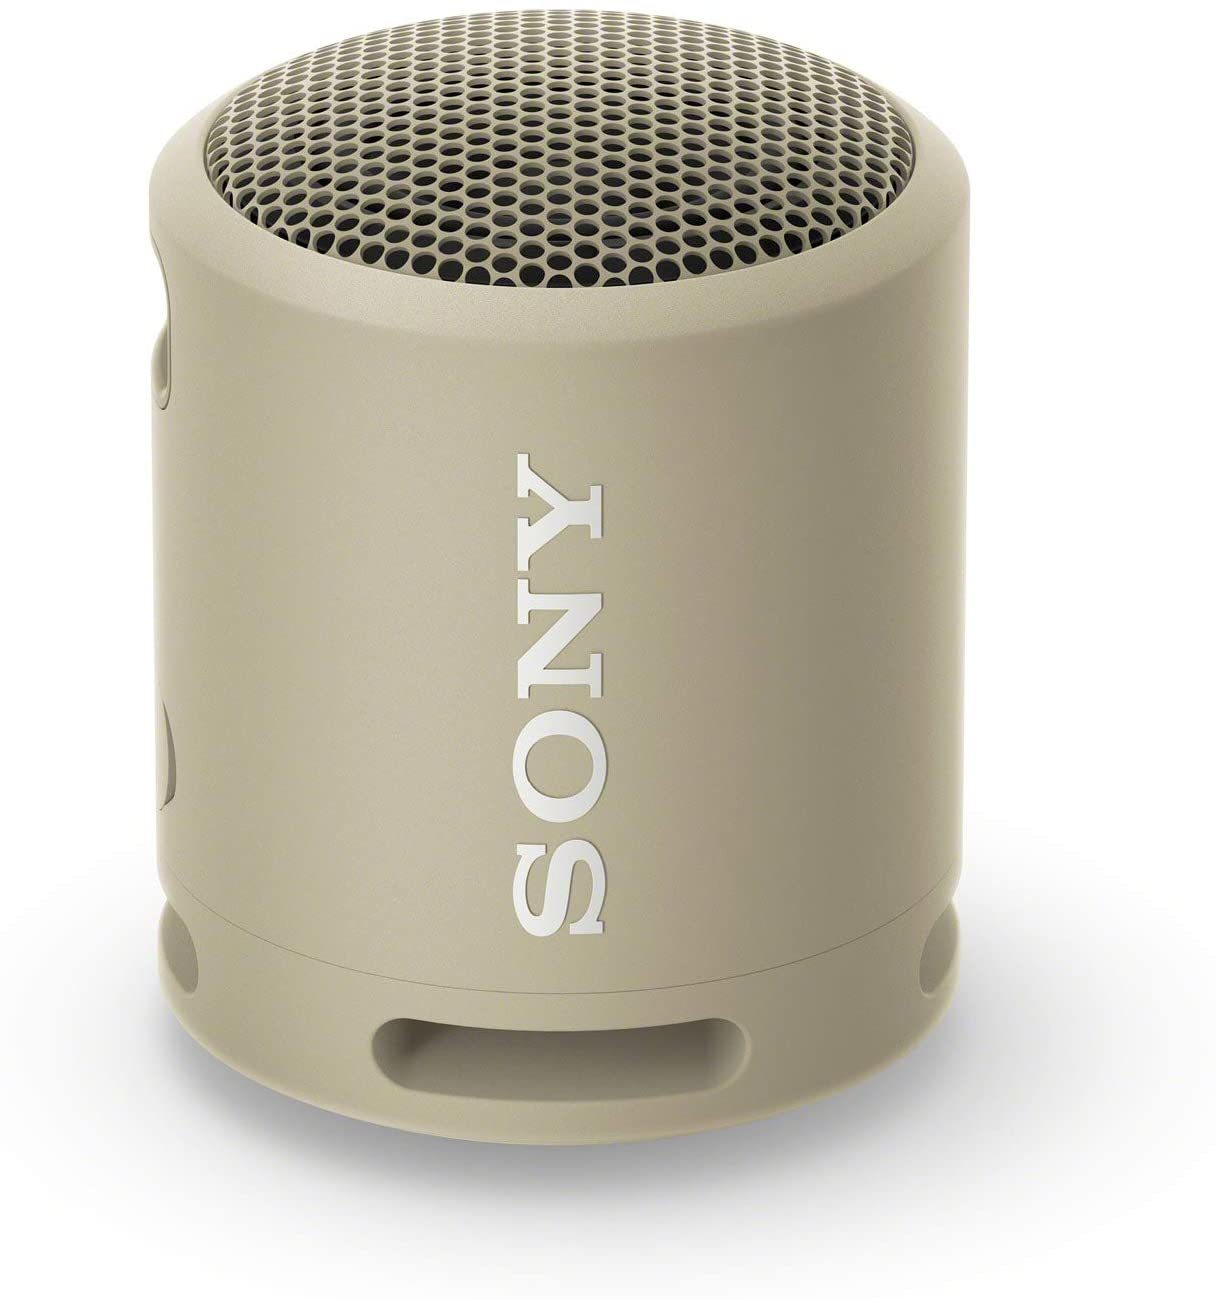 SRS-XB13C портативная акустика Sony EXTRA BASS, бежевый